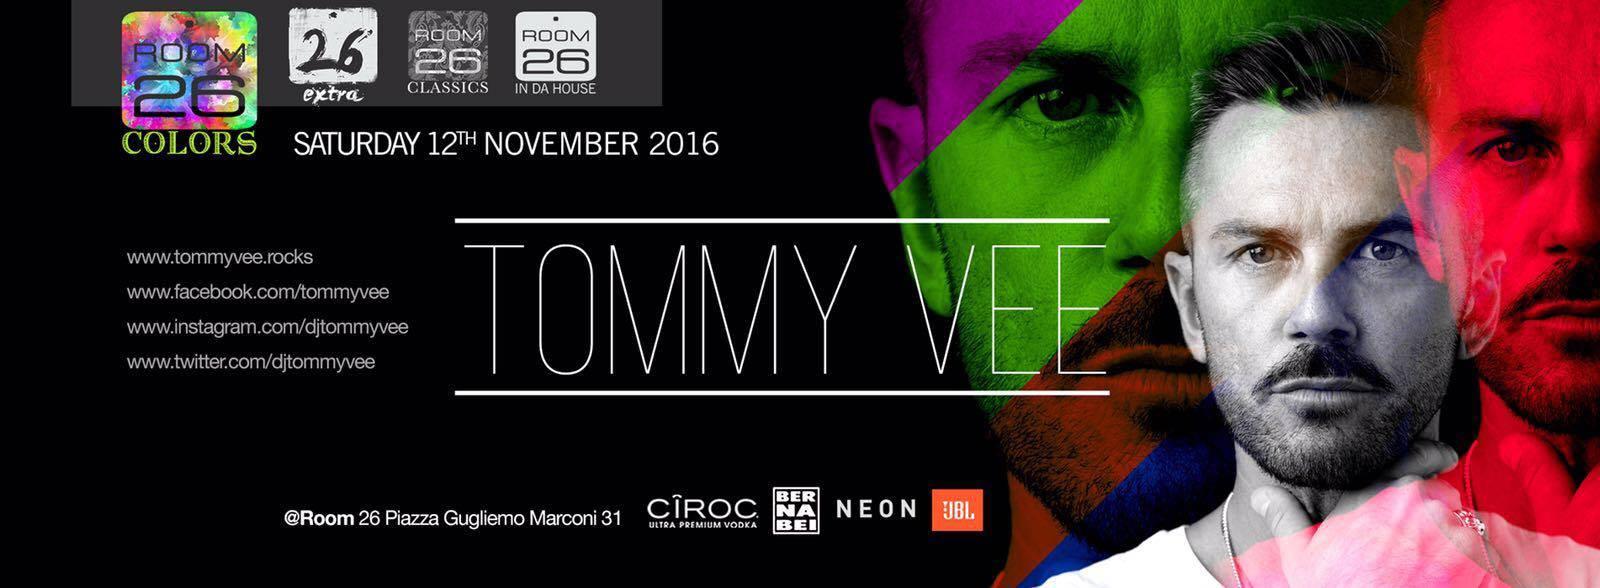 Tommy Vee Room 26 Roma | Sabato 12 novembre 2016